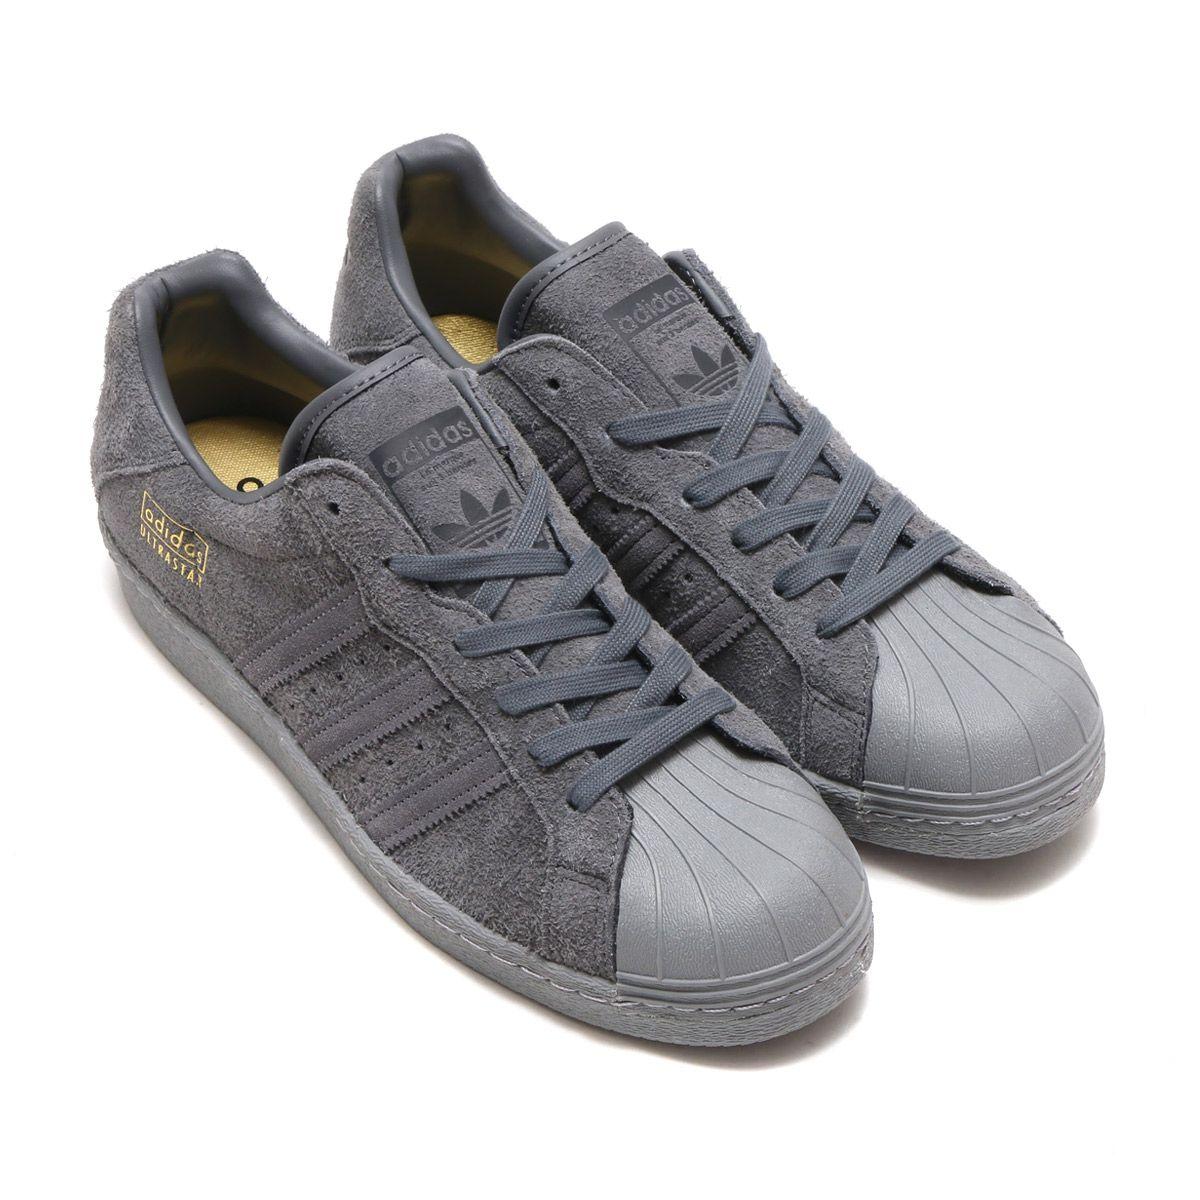 adidas originali ultrastar 80 grey 5 / utilità nero / grigio - 3